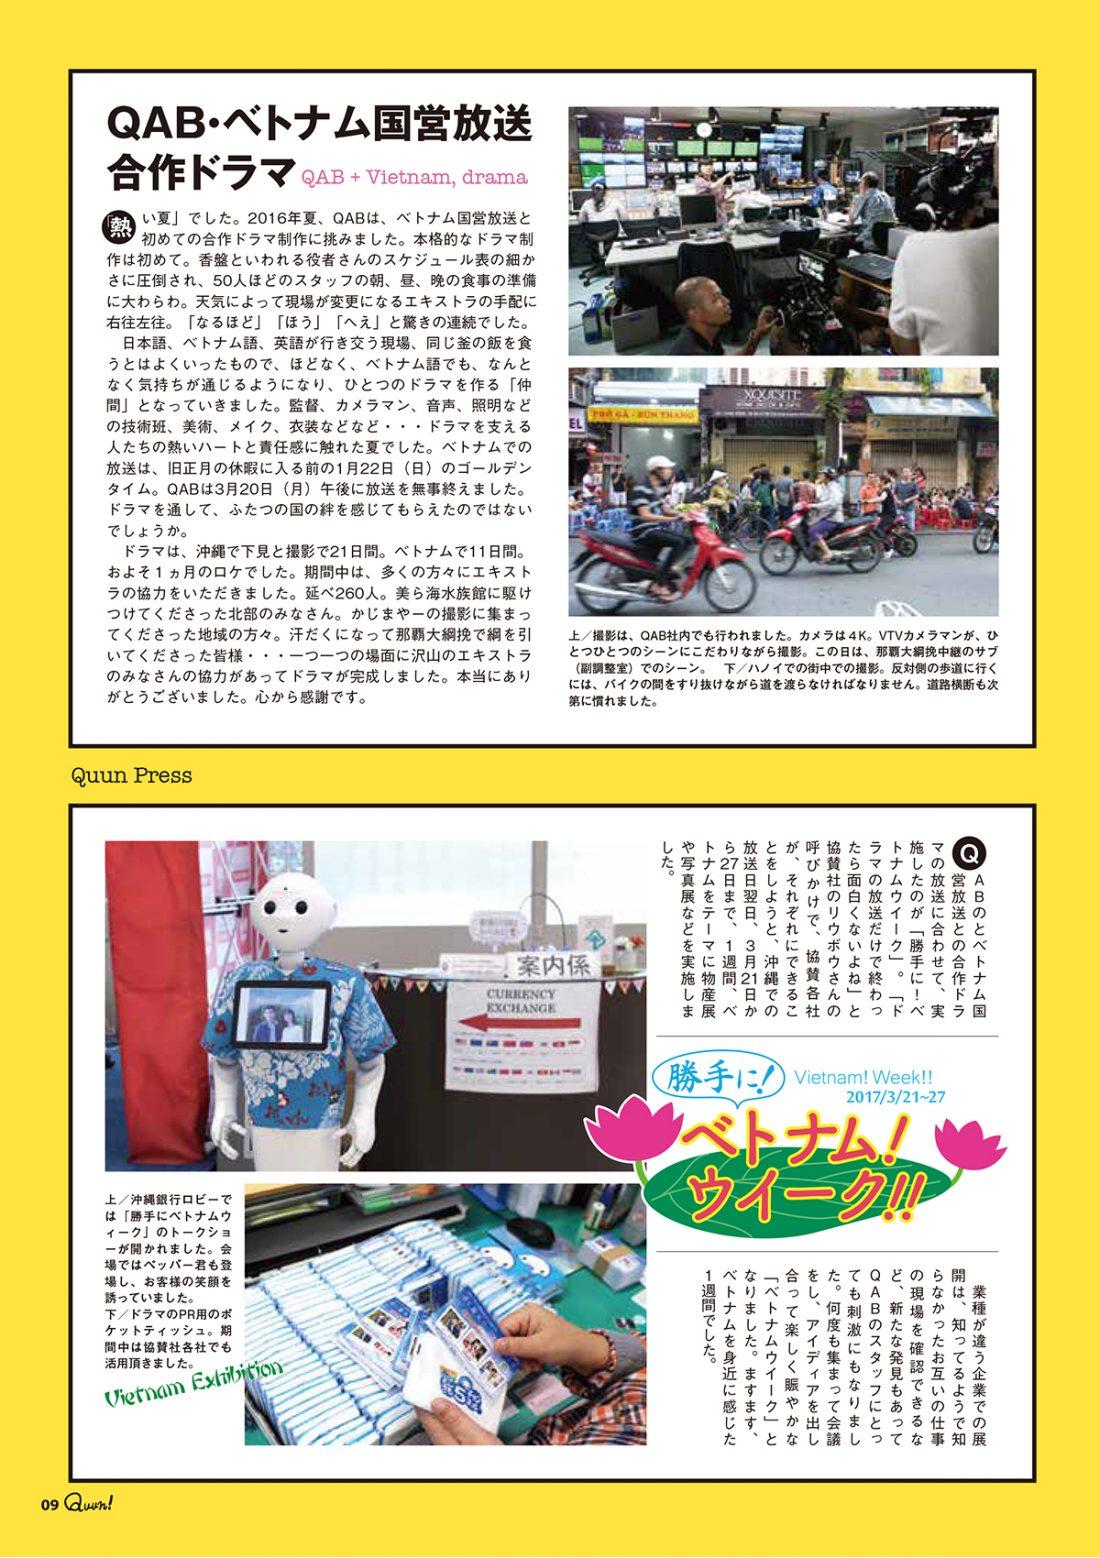 https://www.qab.co.jp/qgoro/wp-content/uploads/quun_0711-1100x1558.jpg